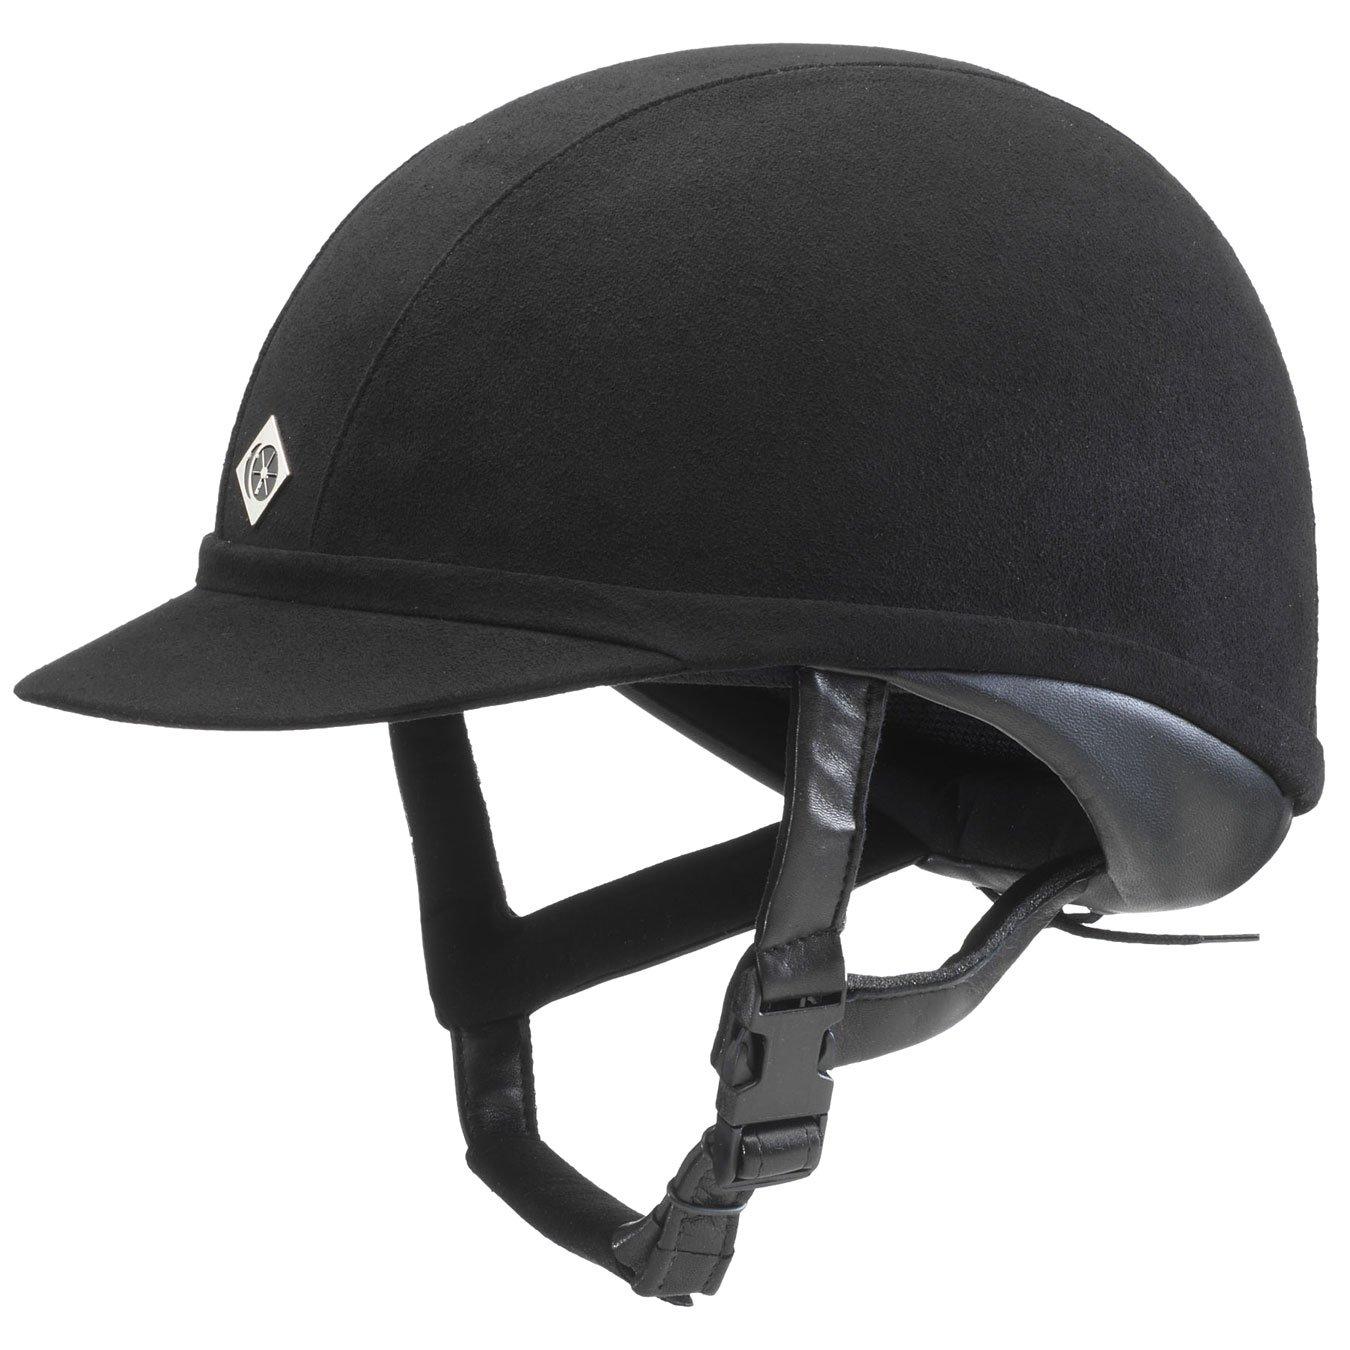 Charles Owen Wellington Professional Riding Helmets